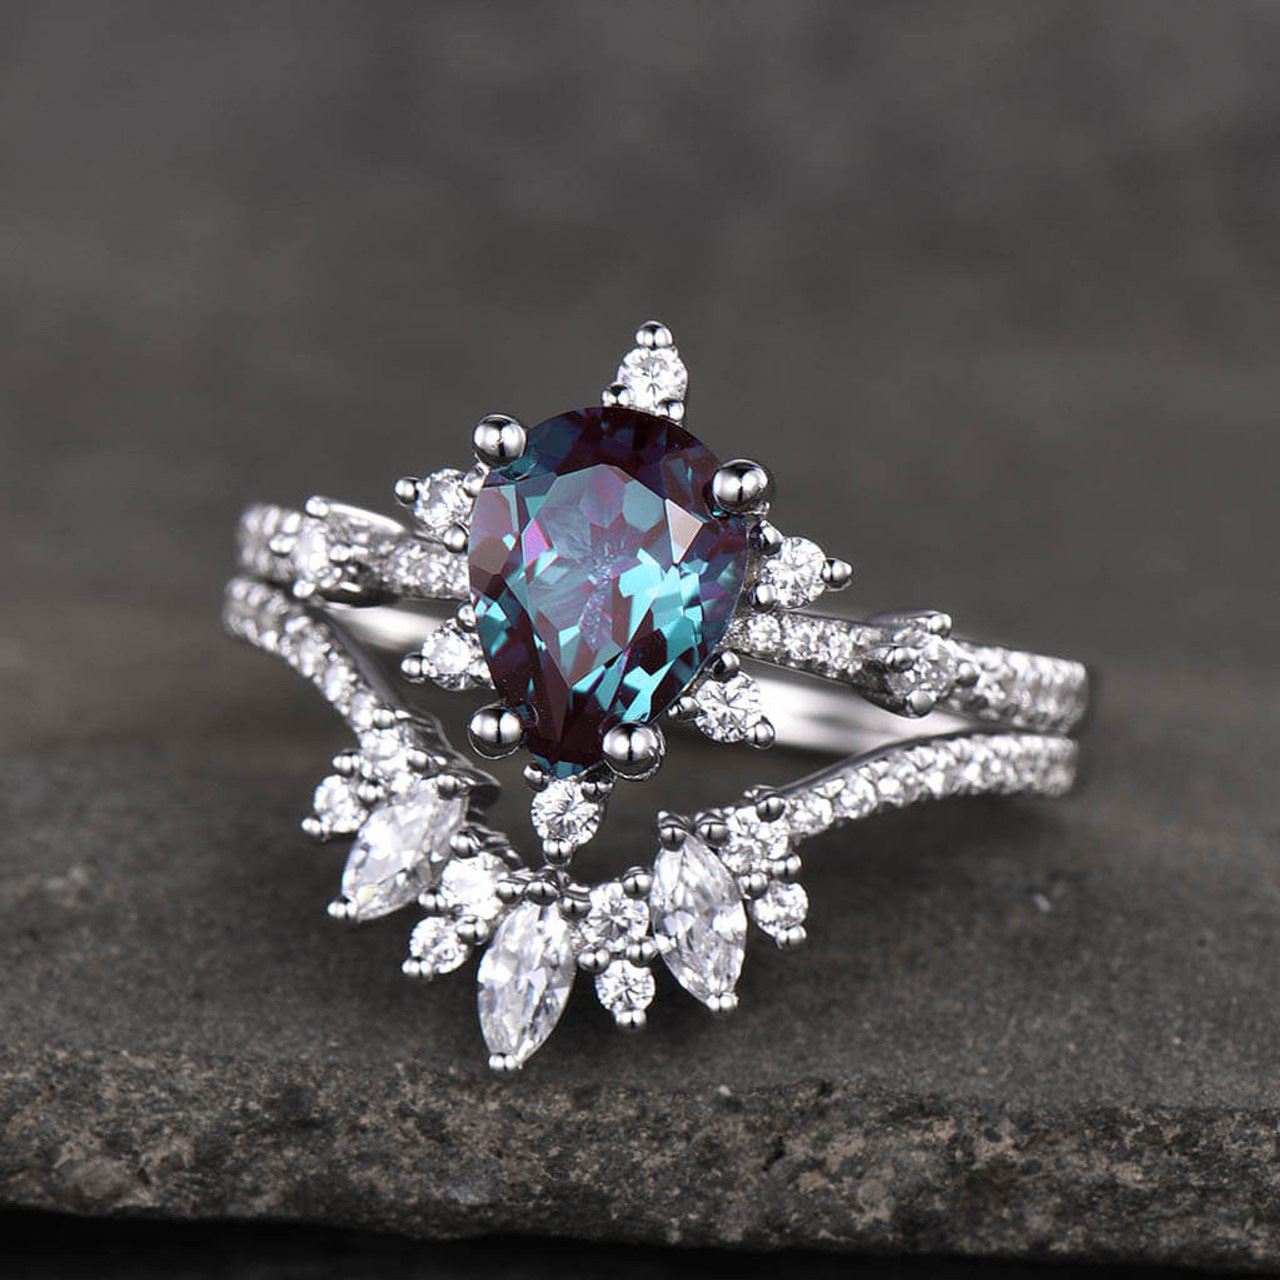 14K/18K Gold Pear Shaped Alexandrite Diamond Art Deco Color Change Engagement Ring Set